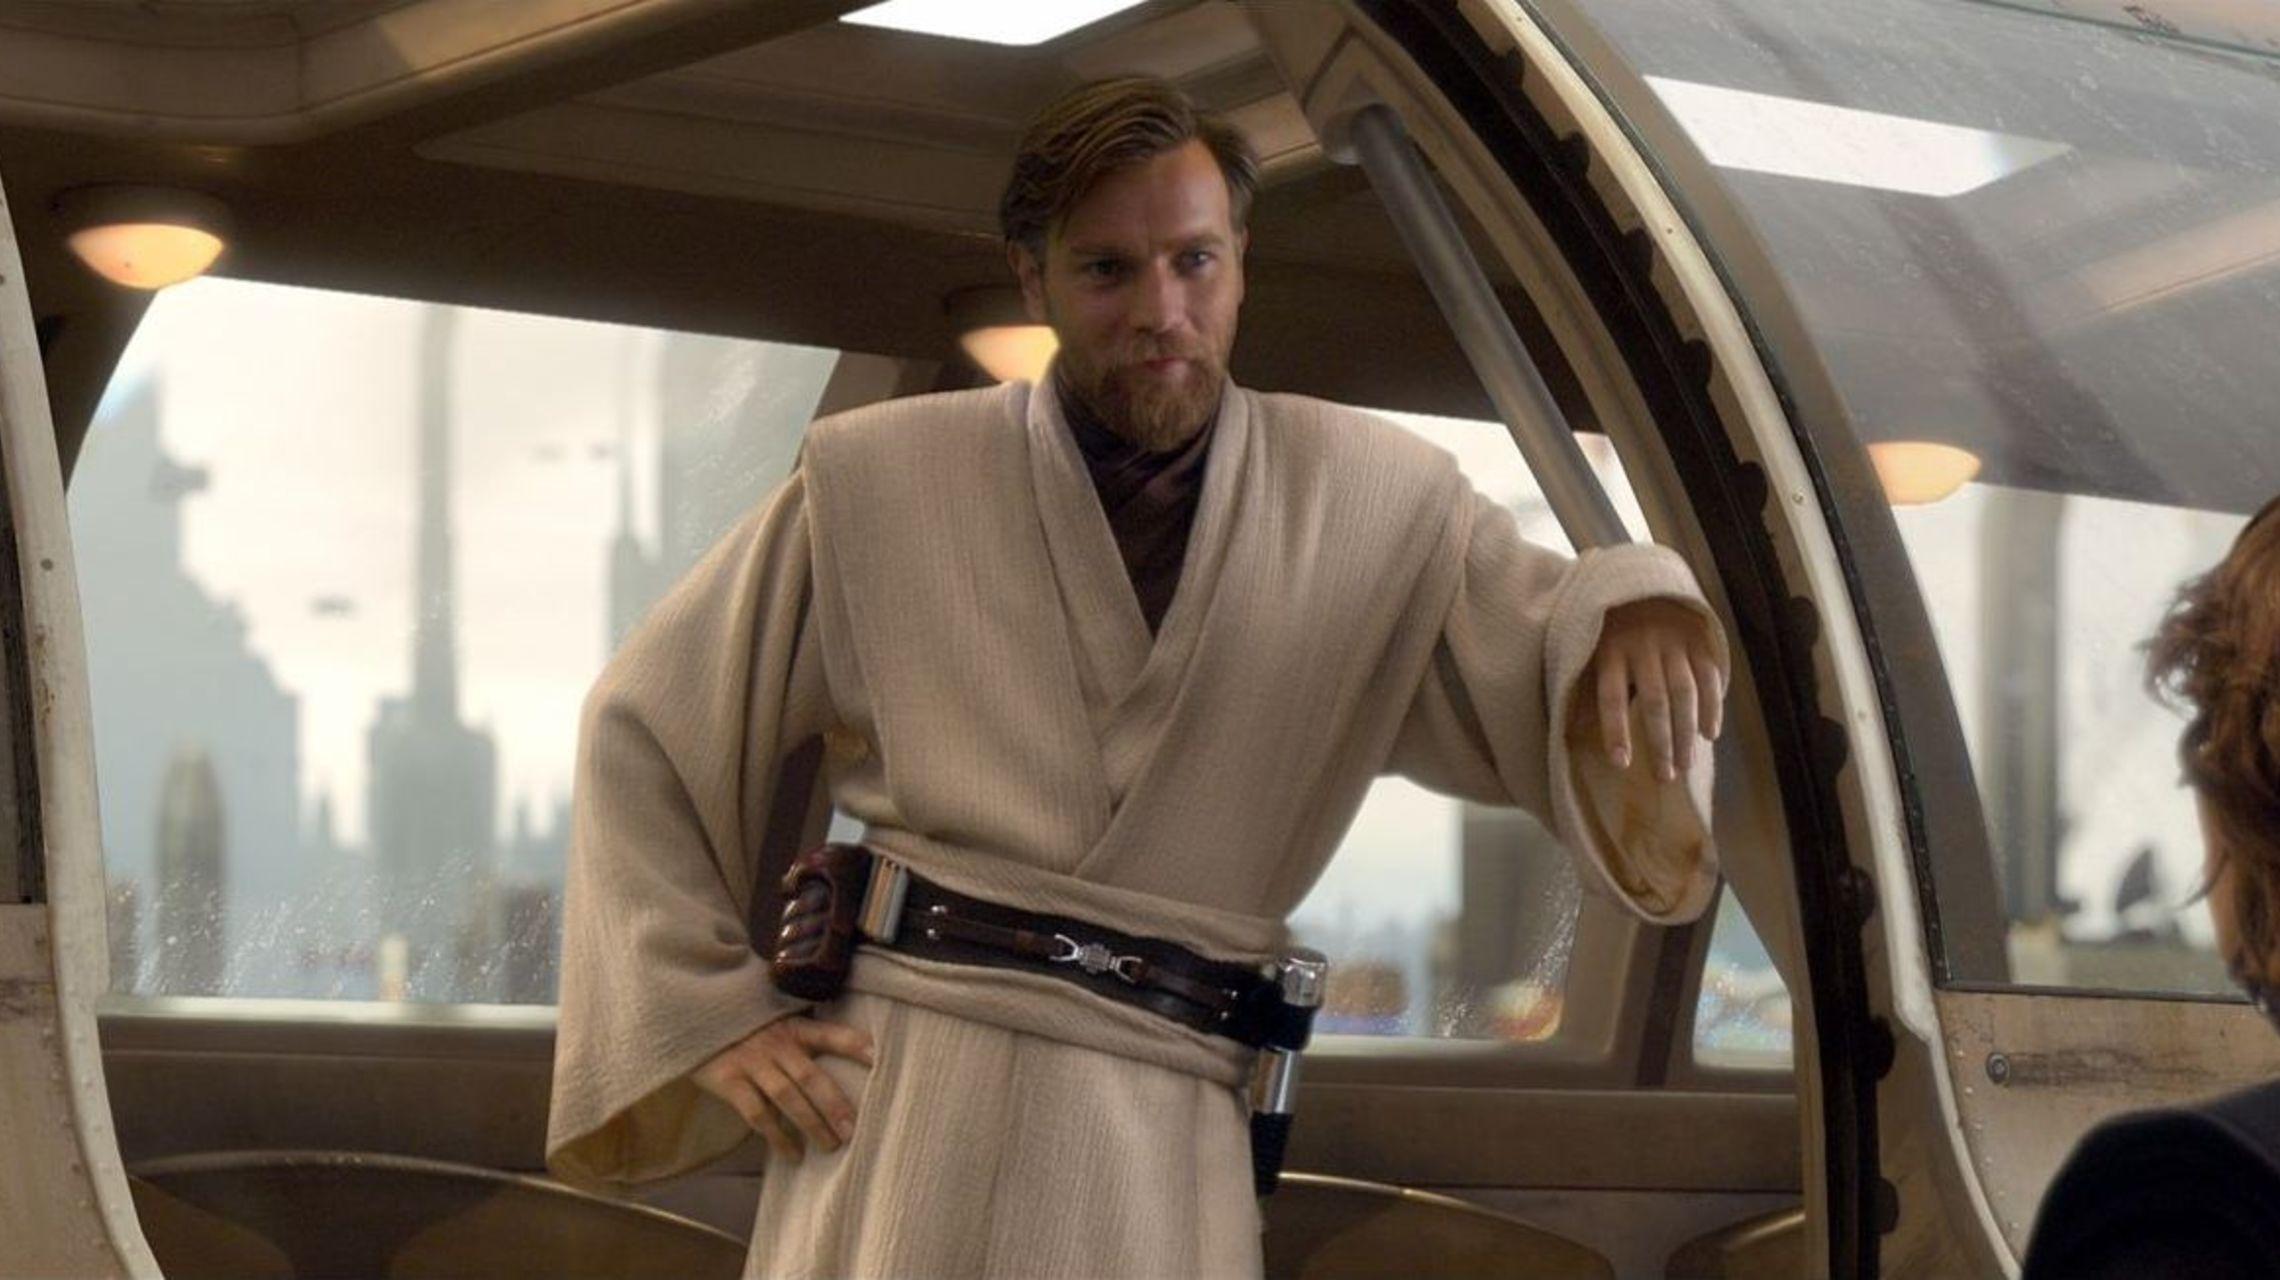 The Obi Wan Kenobi Star Wars Series On Disney Plus Just Got A Major Change Techradar